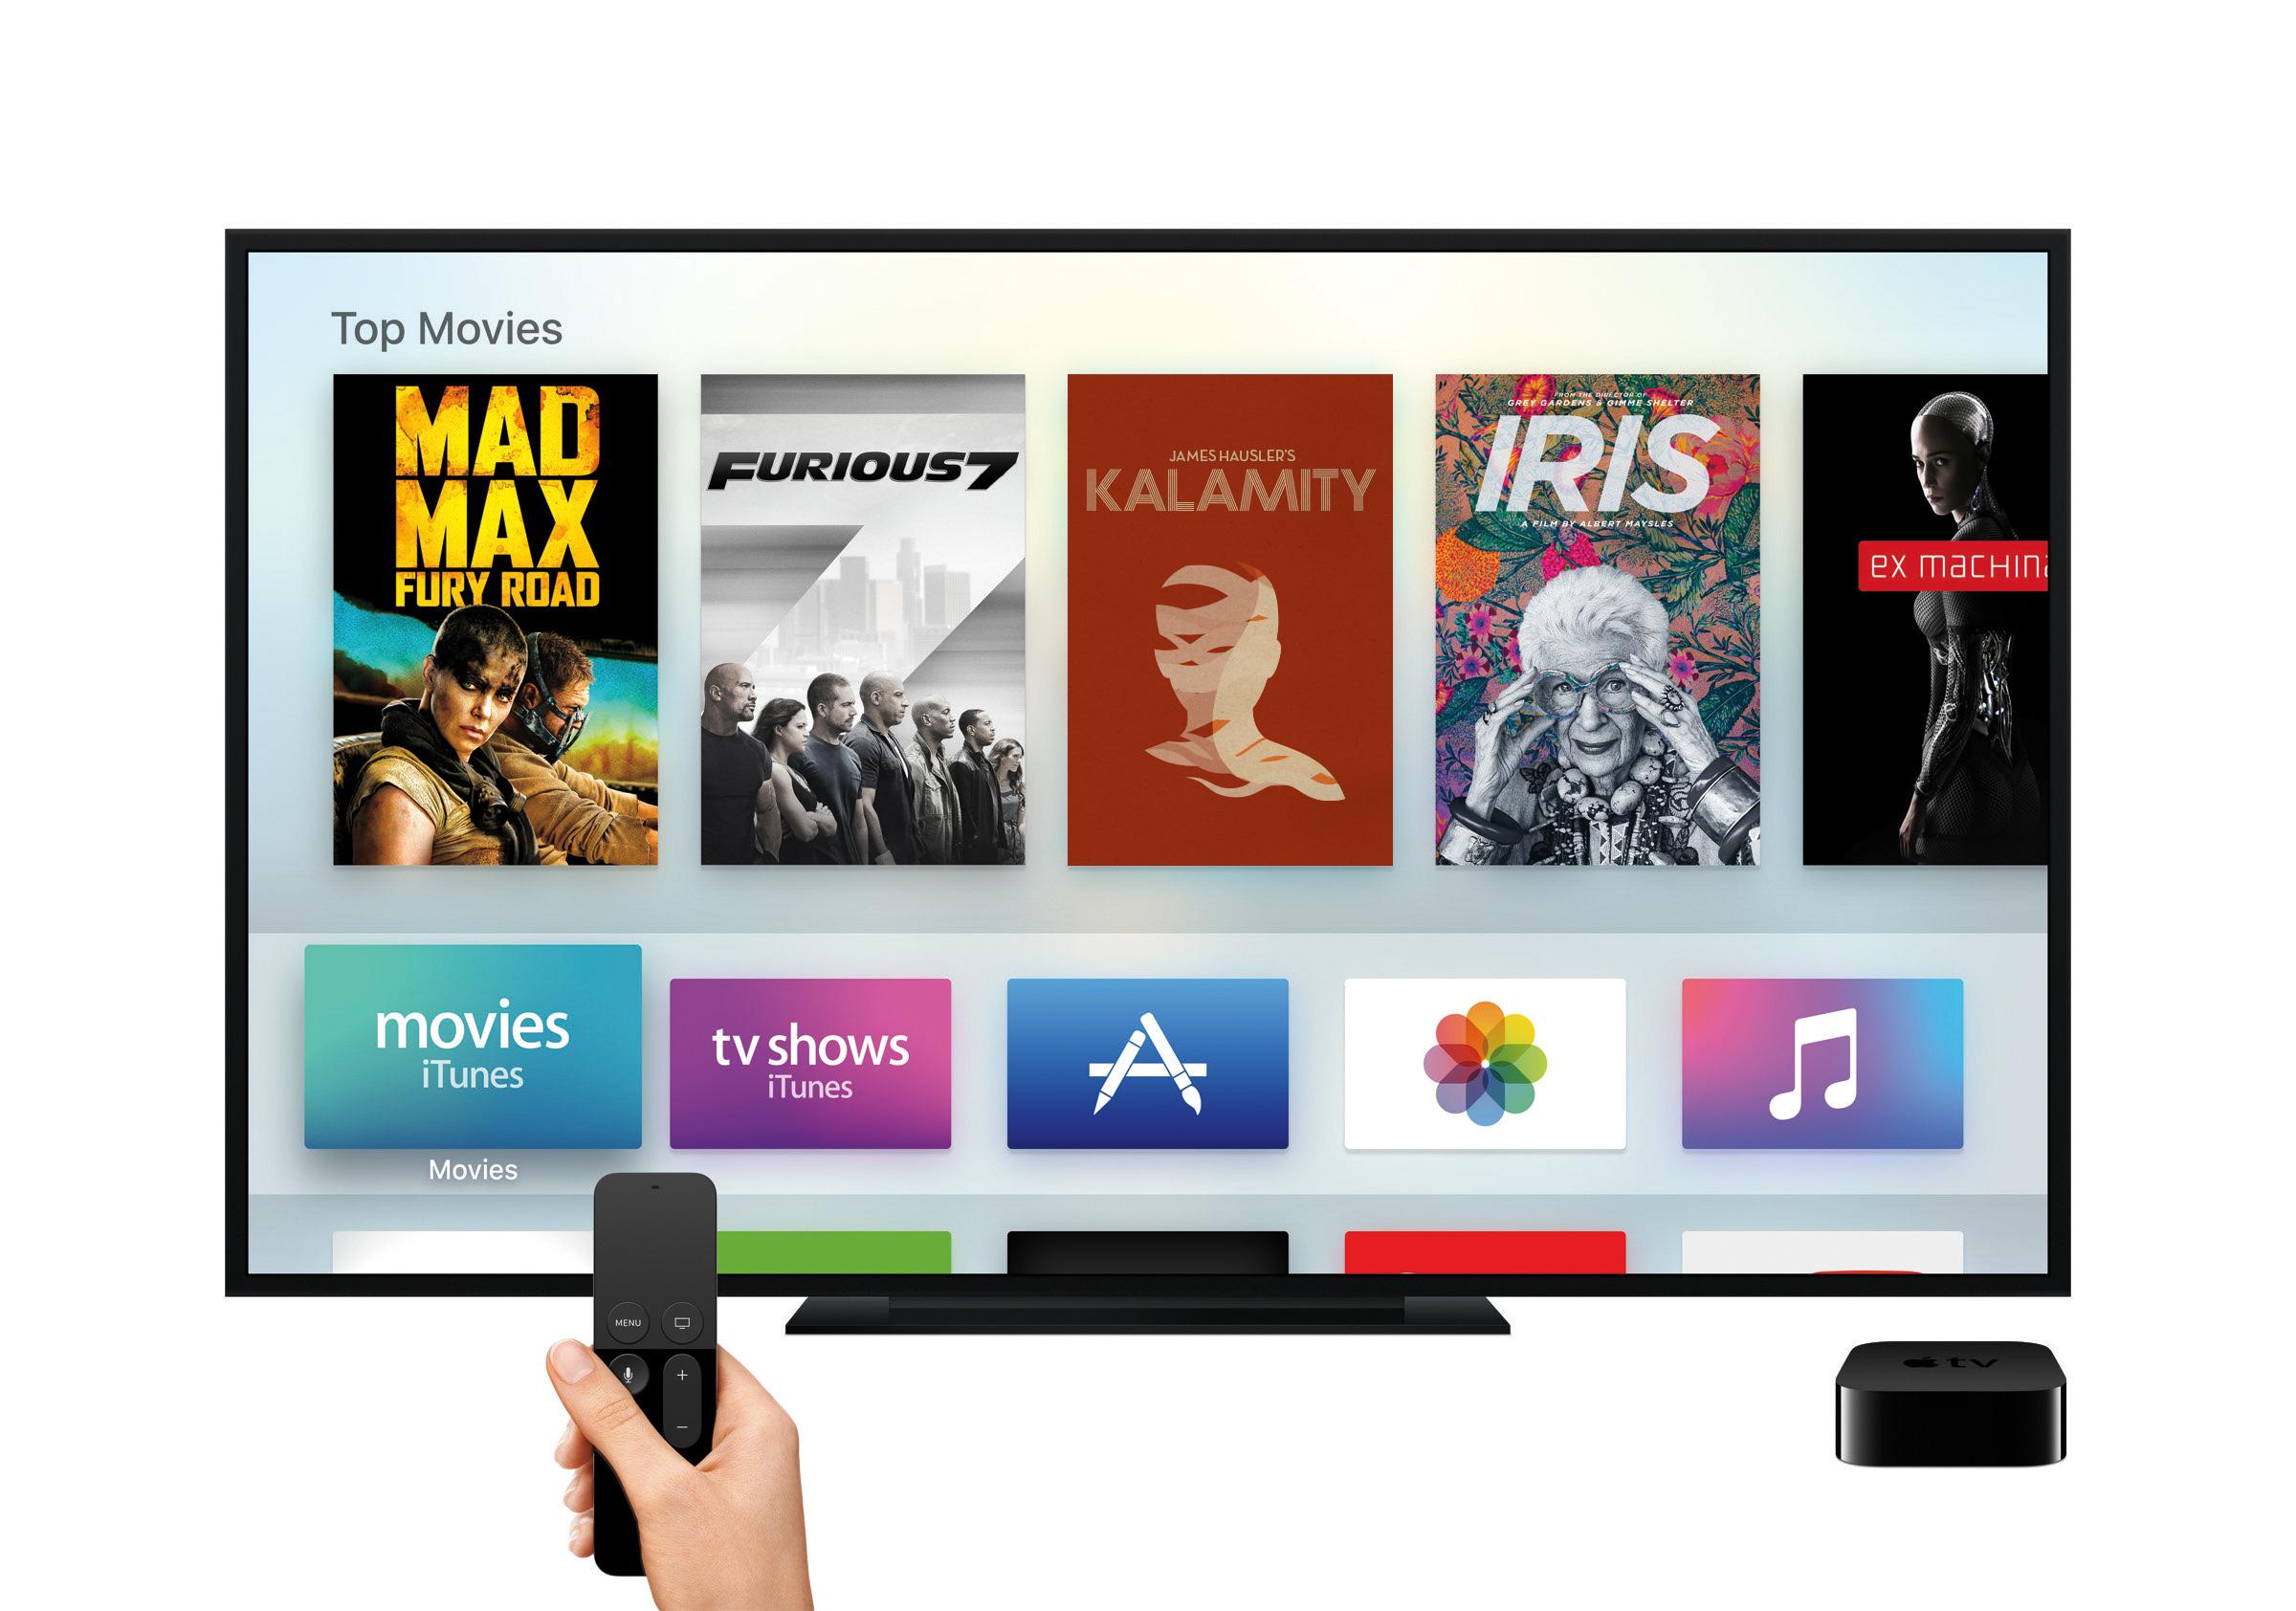 apple-tv-selection-screen.jpg